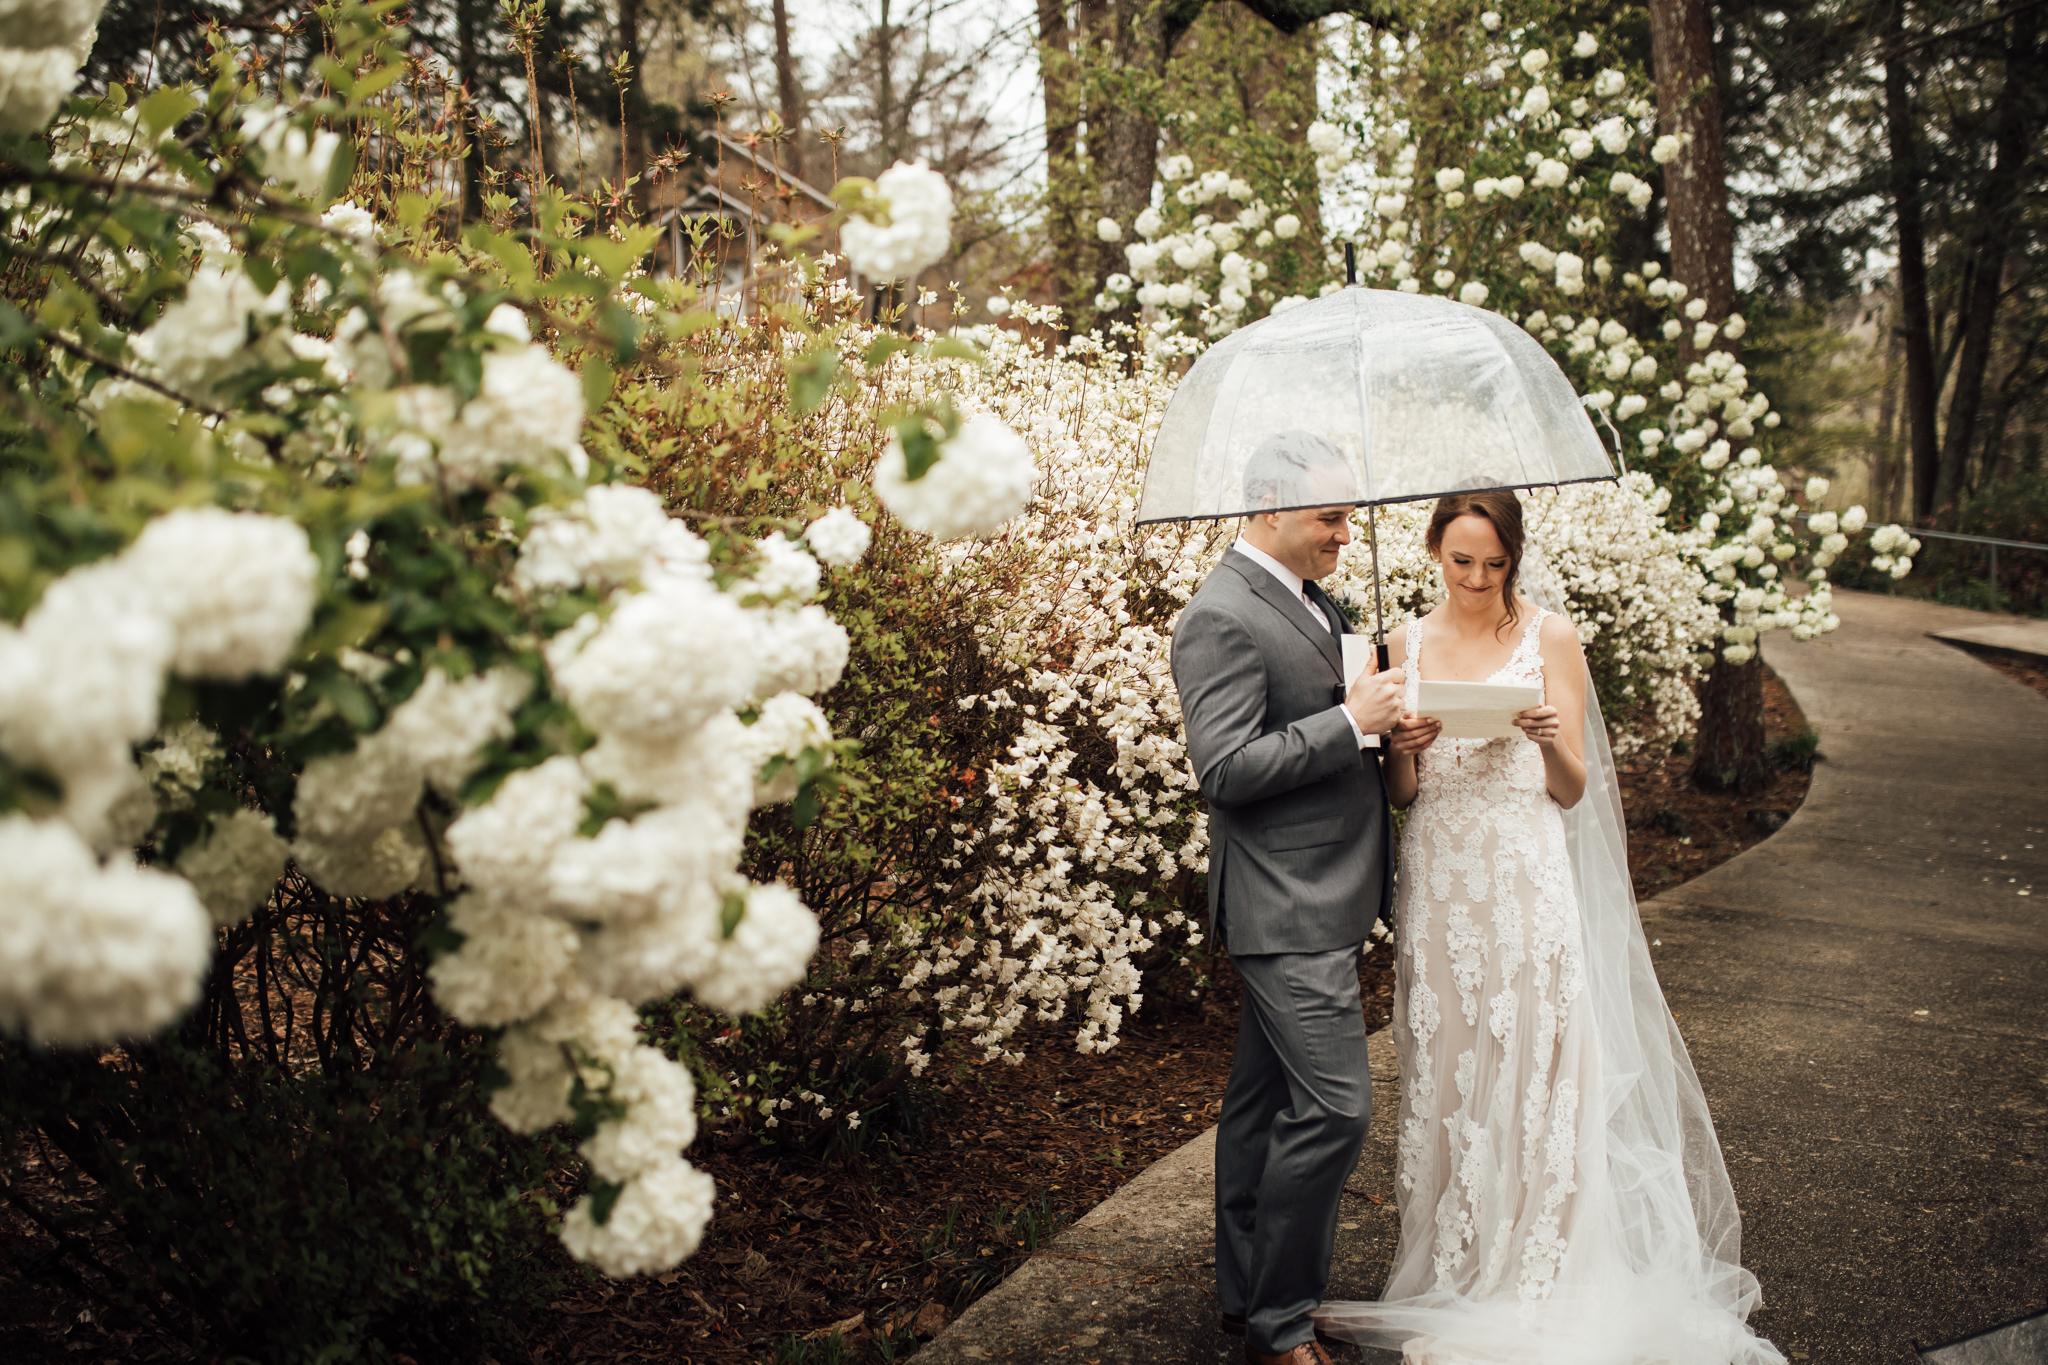 birmingham-alabama-wedding-photographer-laura-terry-the-warmth-around-you (53 of 110).jpg